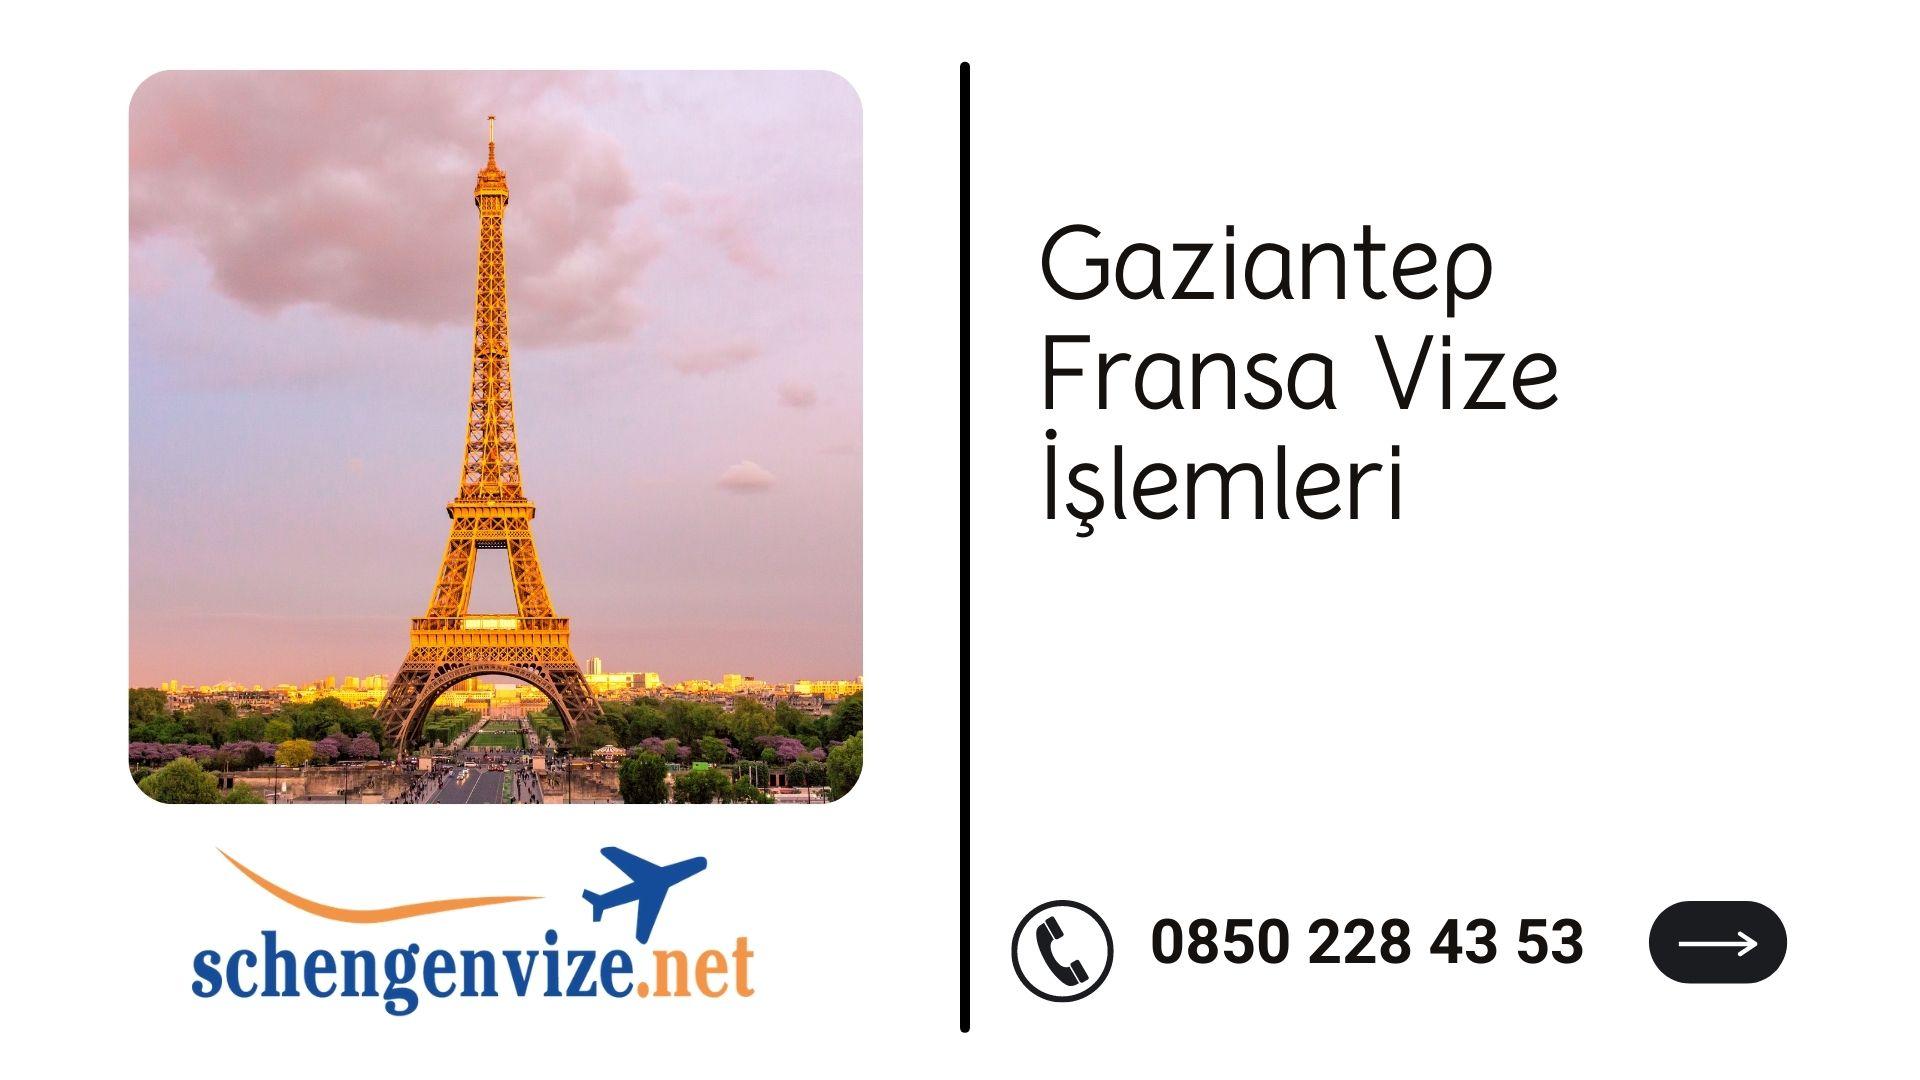 Gaziantep Fransa Vize İşlemleri